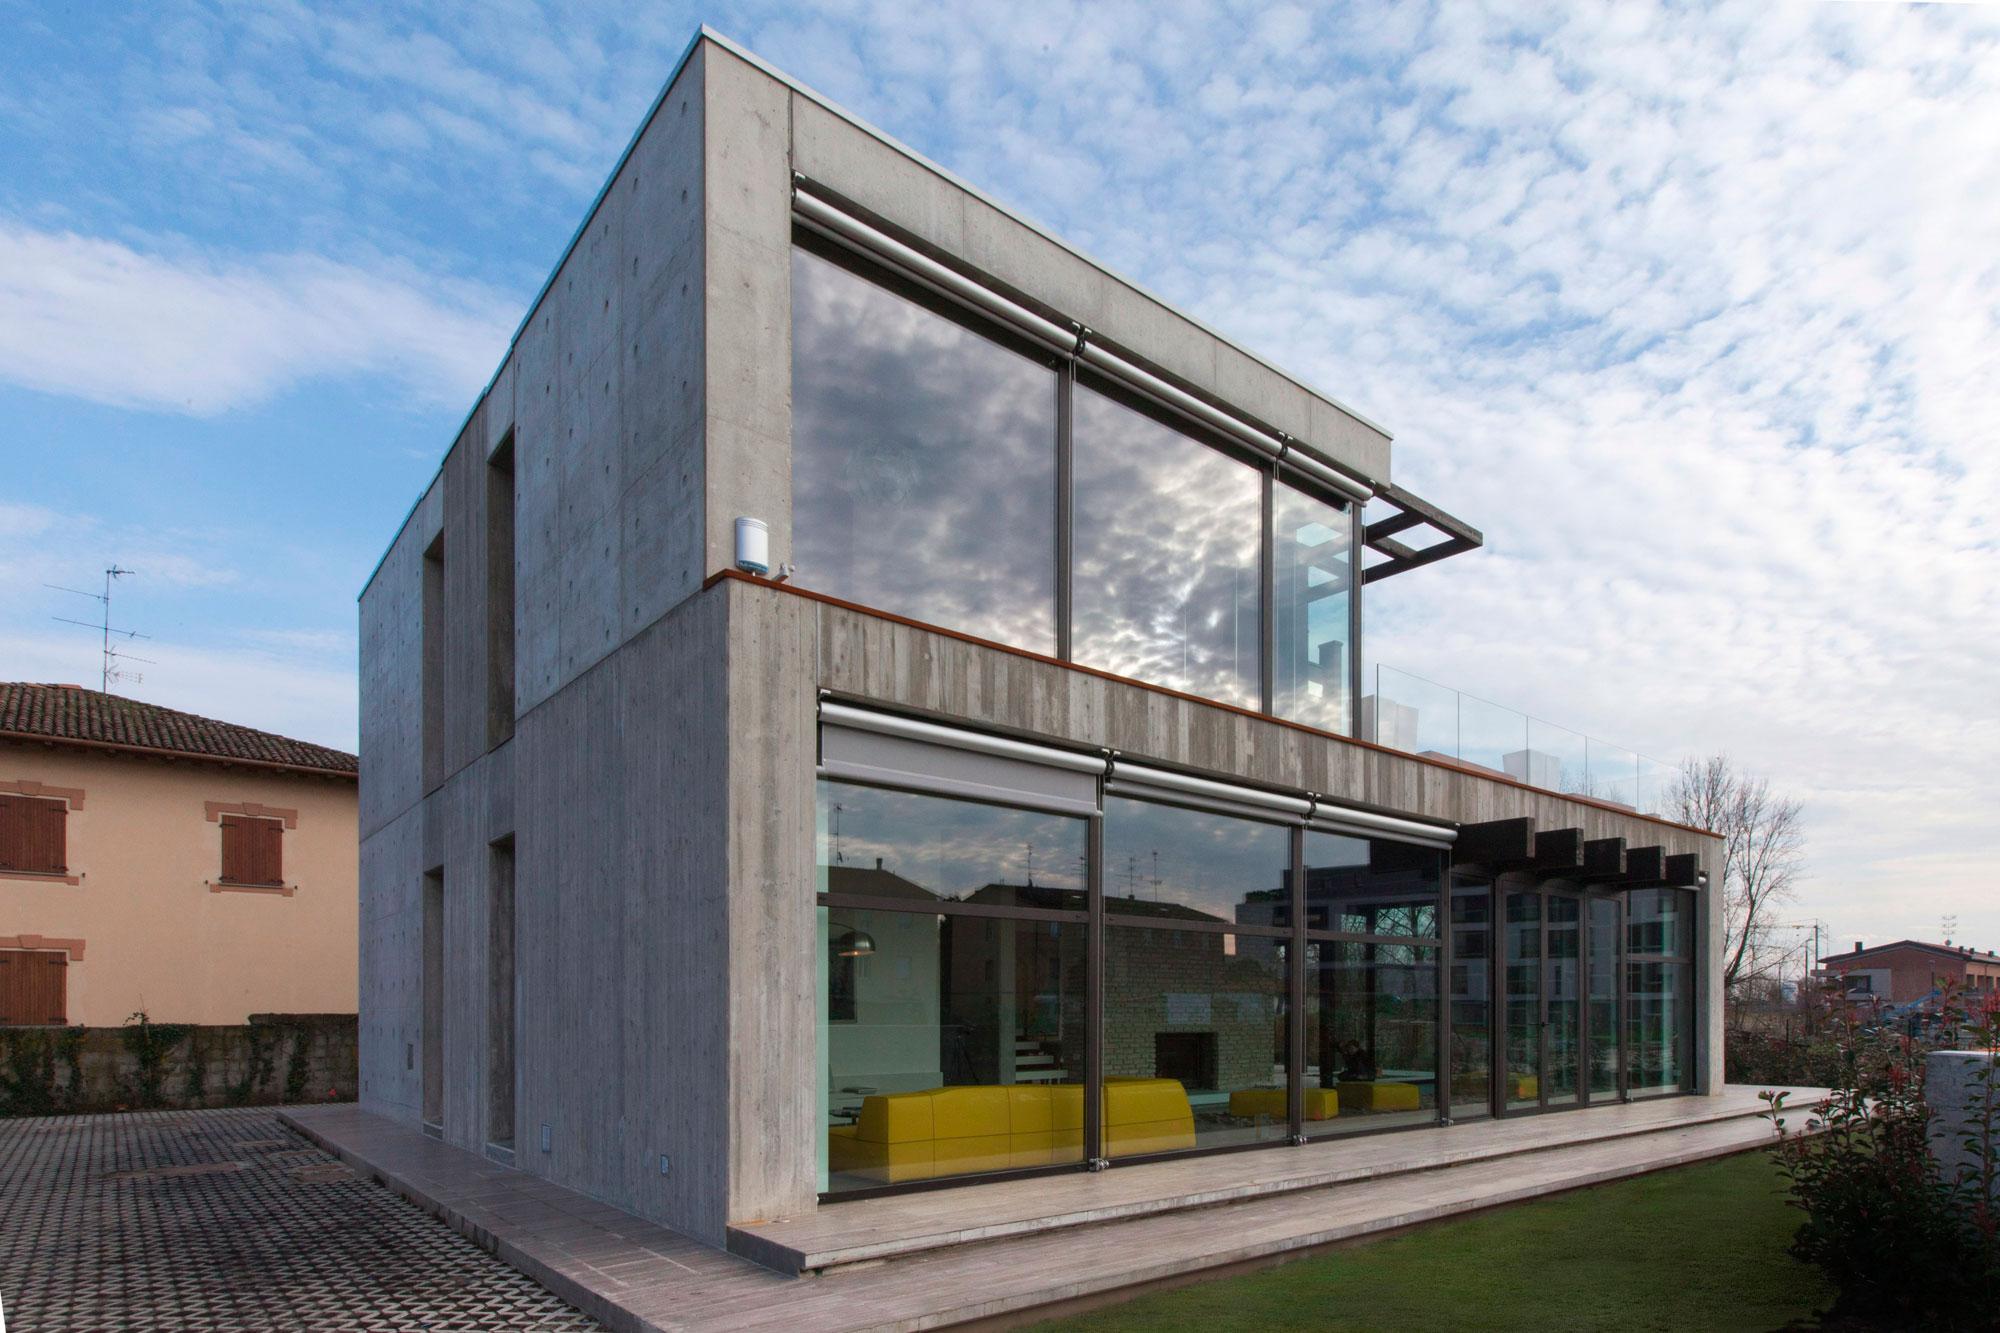 D'Autore Residence near Bologna by Giraldi Associati Architetti-11